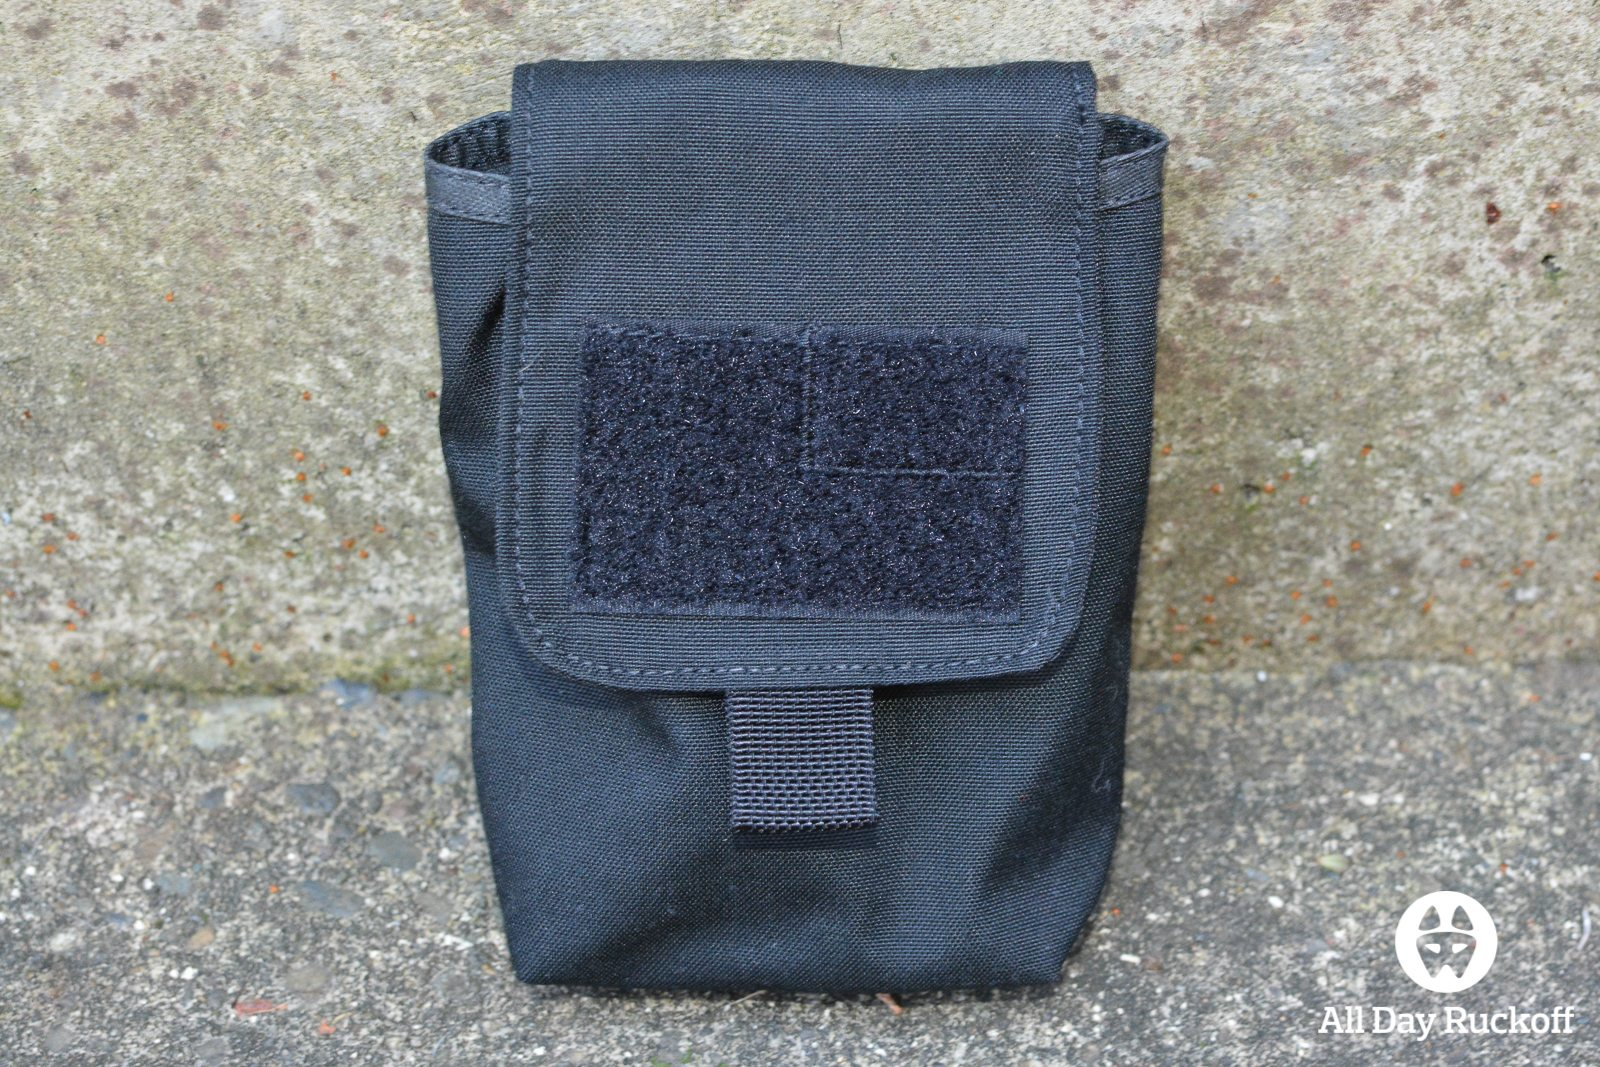 GORUCK Side Pocket